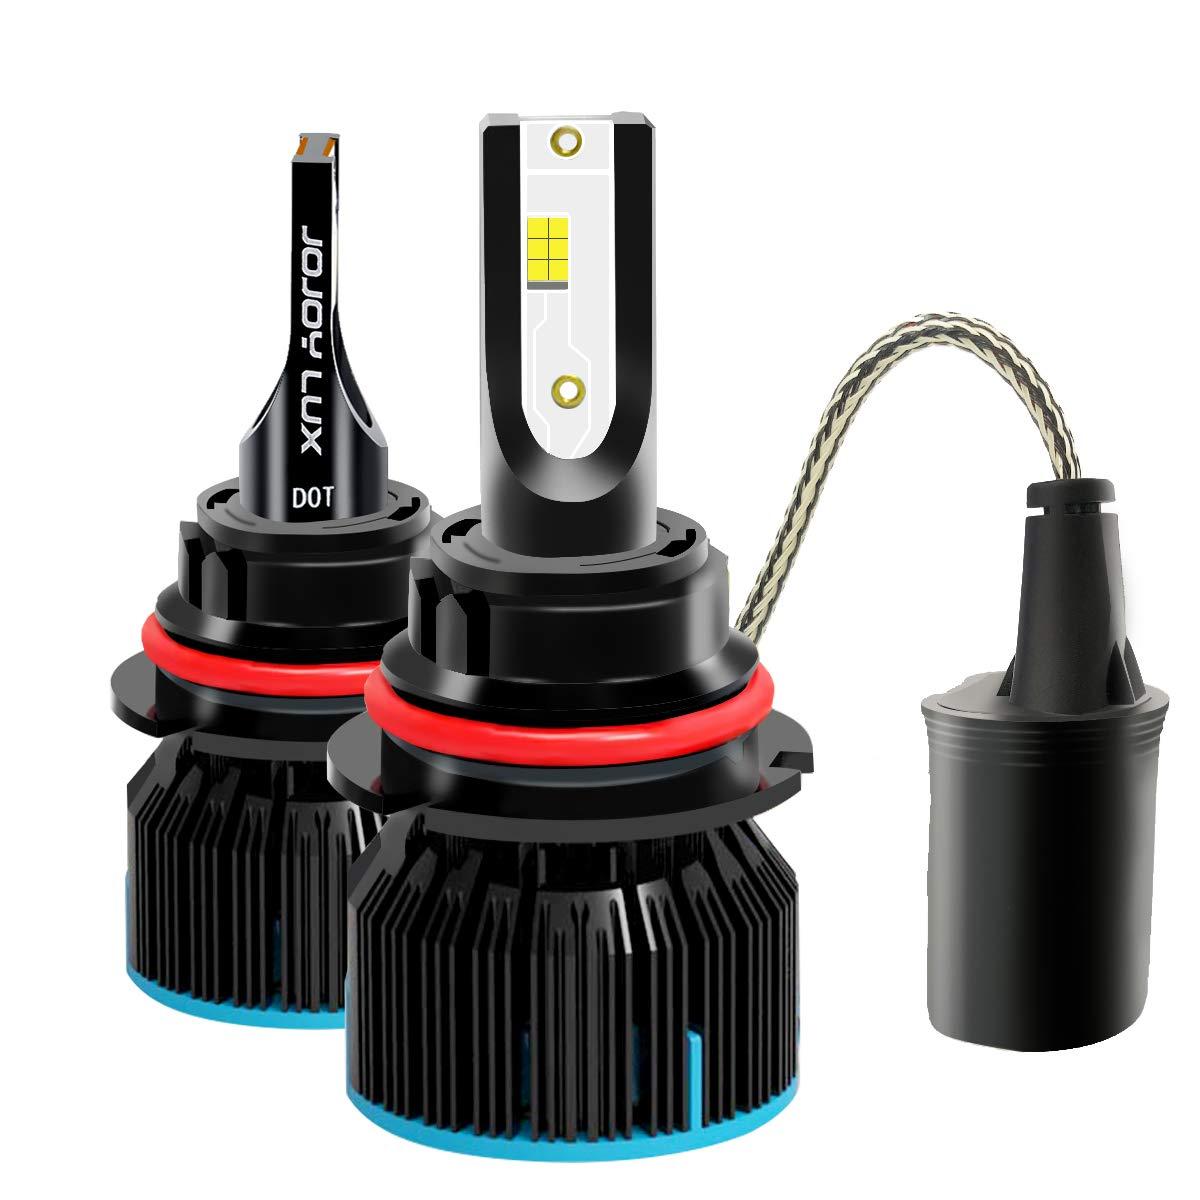 Fog Driving Light Bulb Kit with 56W 6400LM Epistar LED Chips JOJOY LUX H7 LED Low Beam Headlight Conversion Kits Pair of 2 w// 1 yr Warranty High Beam Bulbs 6500K Diamond White Color